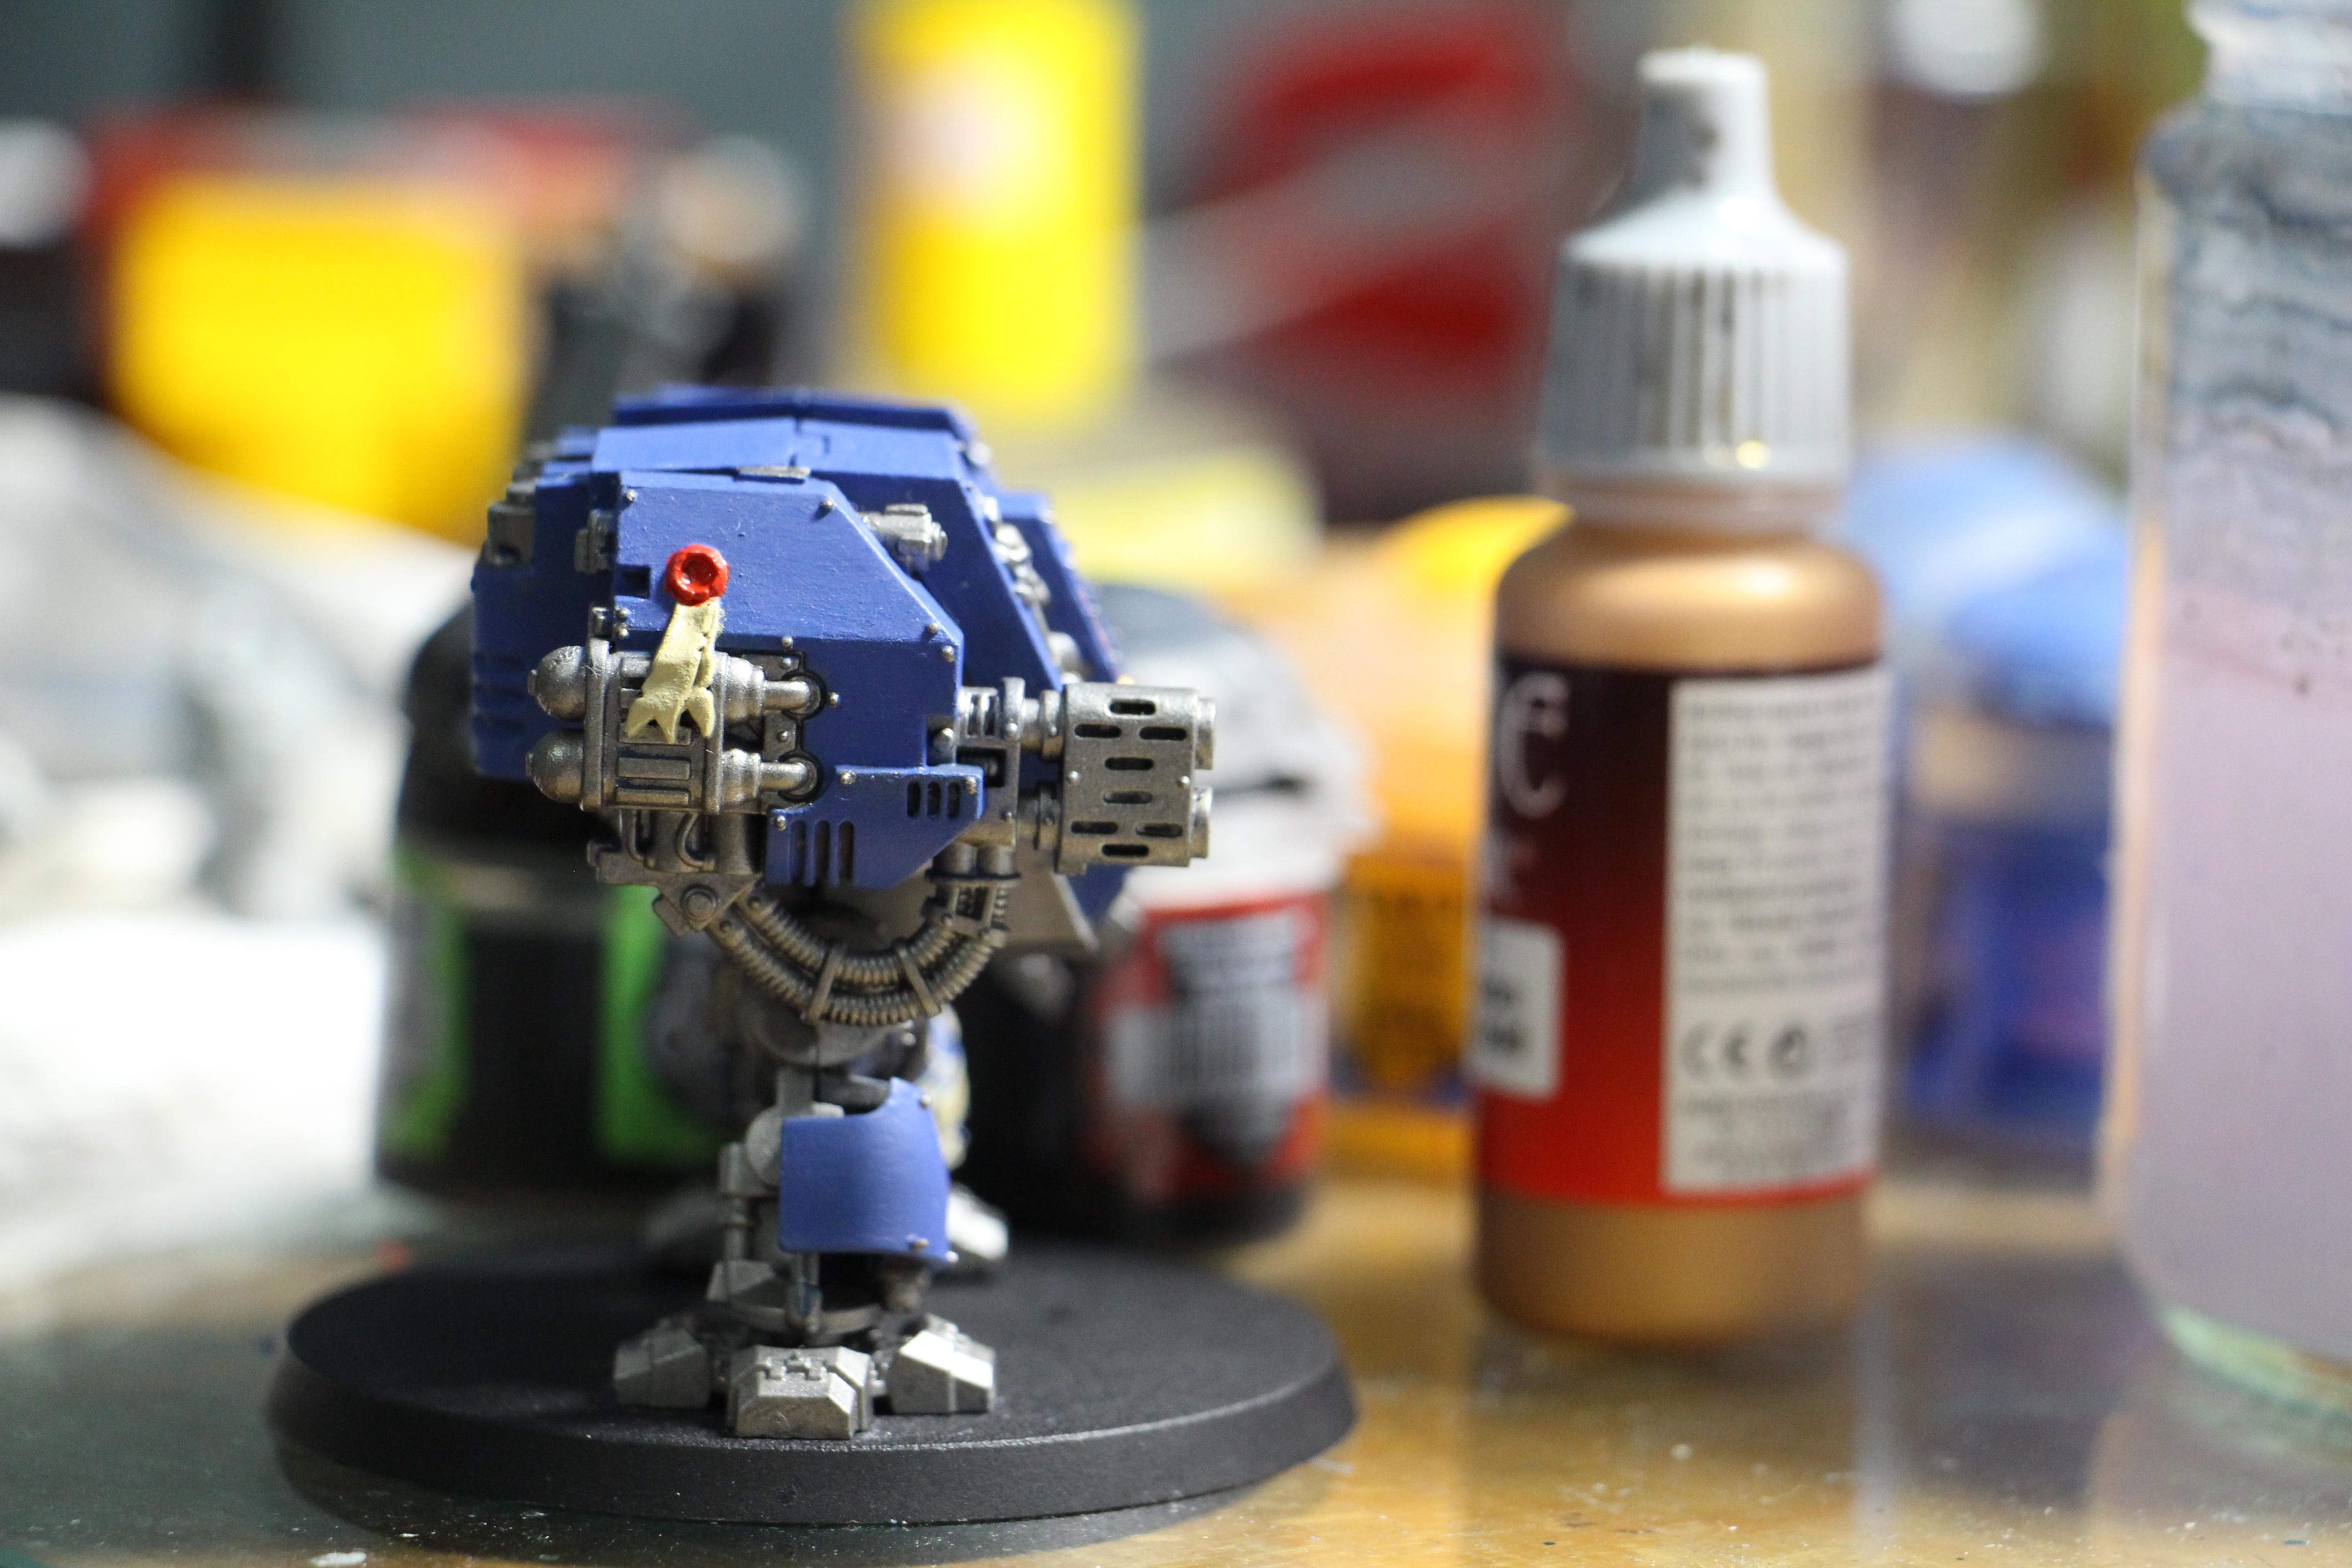 Space Marine Dreadnought, Space Marines, Ultramarines